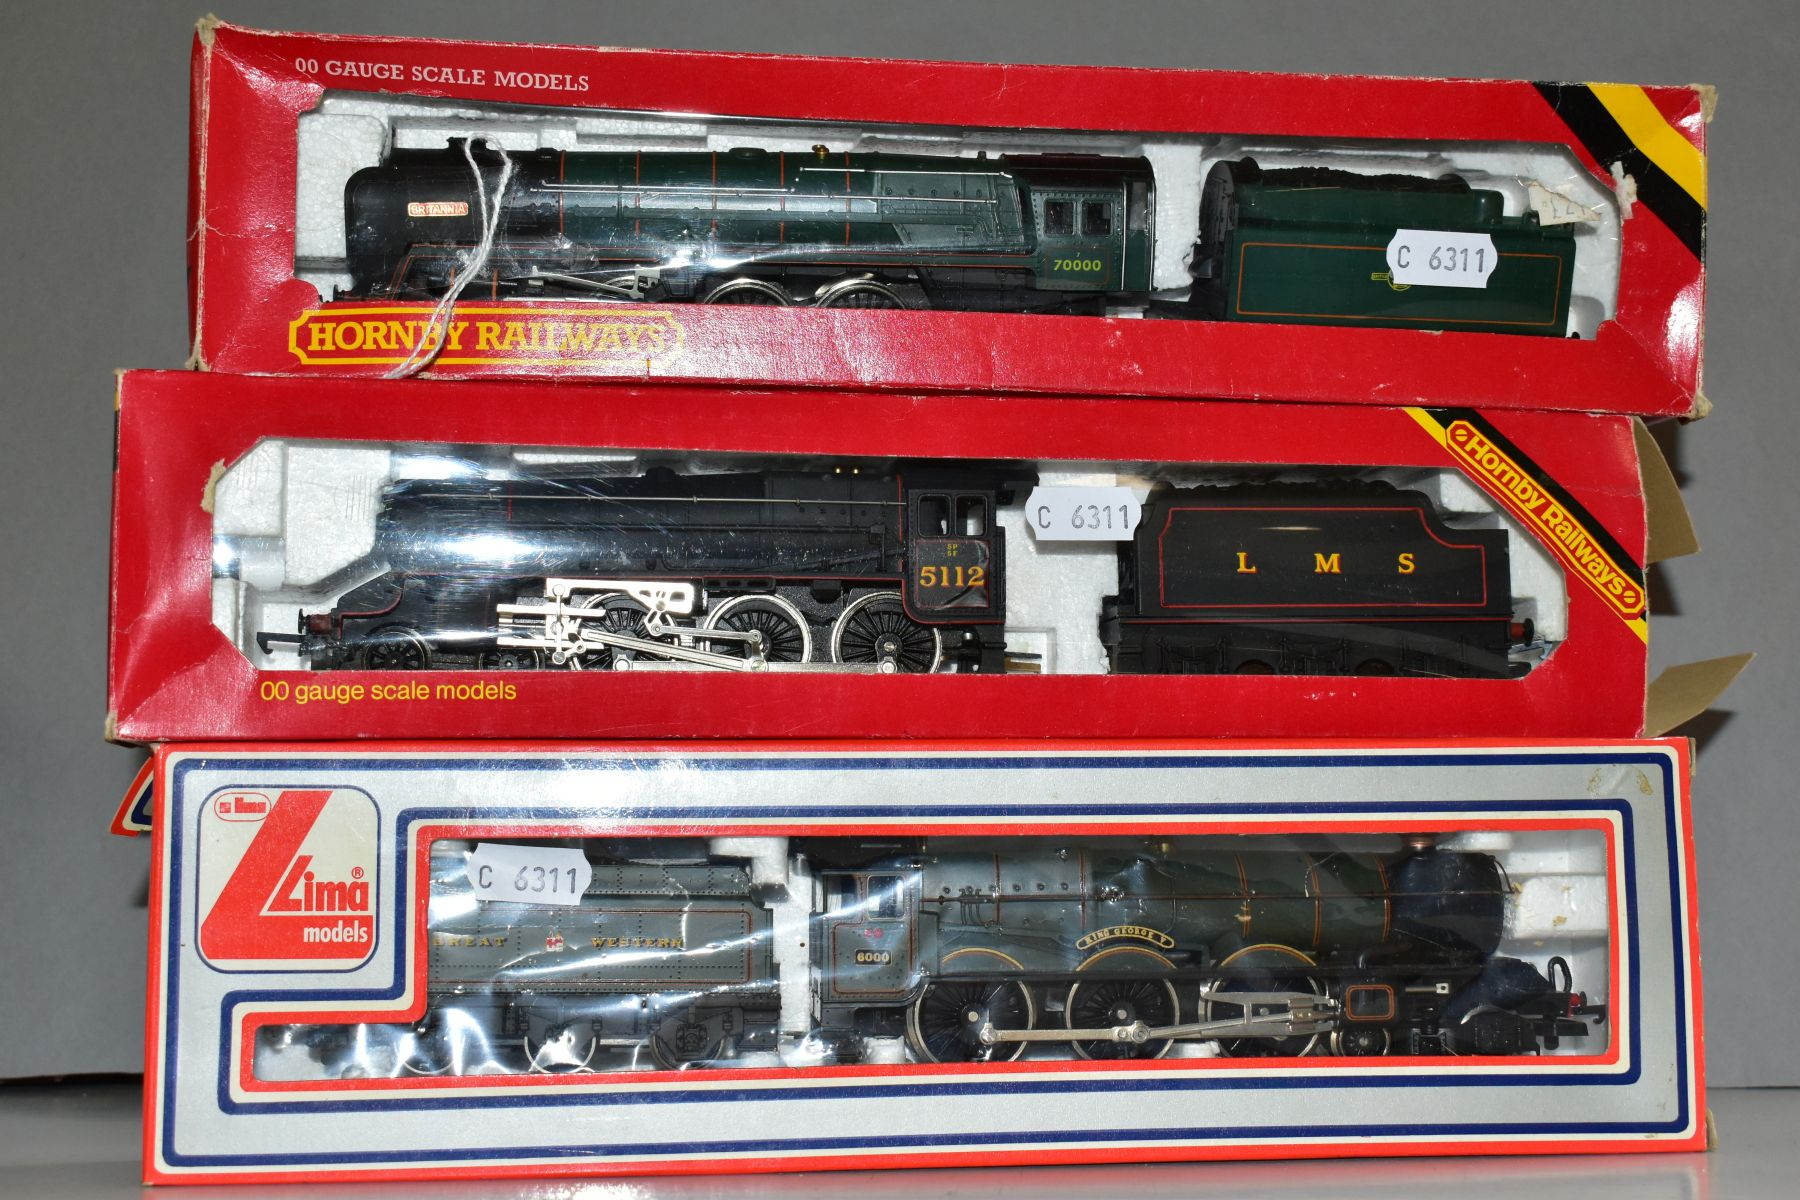 THREE BOXED 00 GAUGE MODEL RAILWAY LOCOMOTIVES, Hornby Britannia Class 'Britanna' No. 70000, B.R. - Image 2 of 3